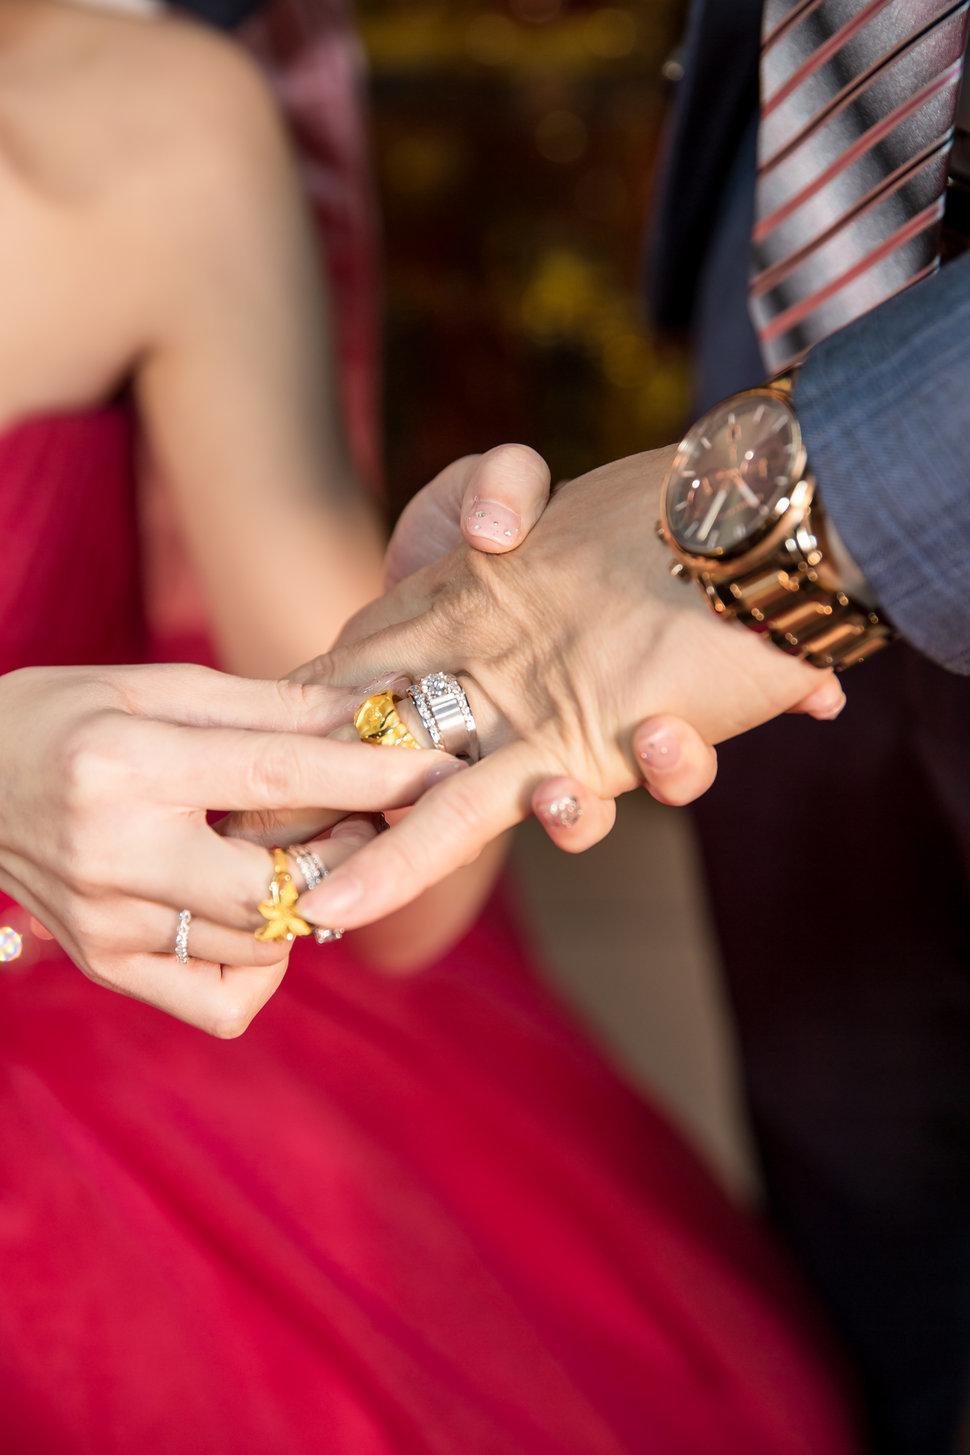 SIN_8134 - 板橋唐朝婚紗 - 結婚吧一站式婚禮服務平台